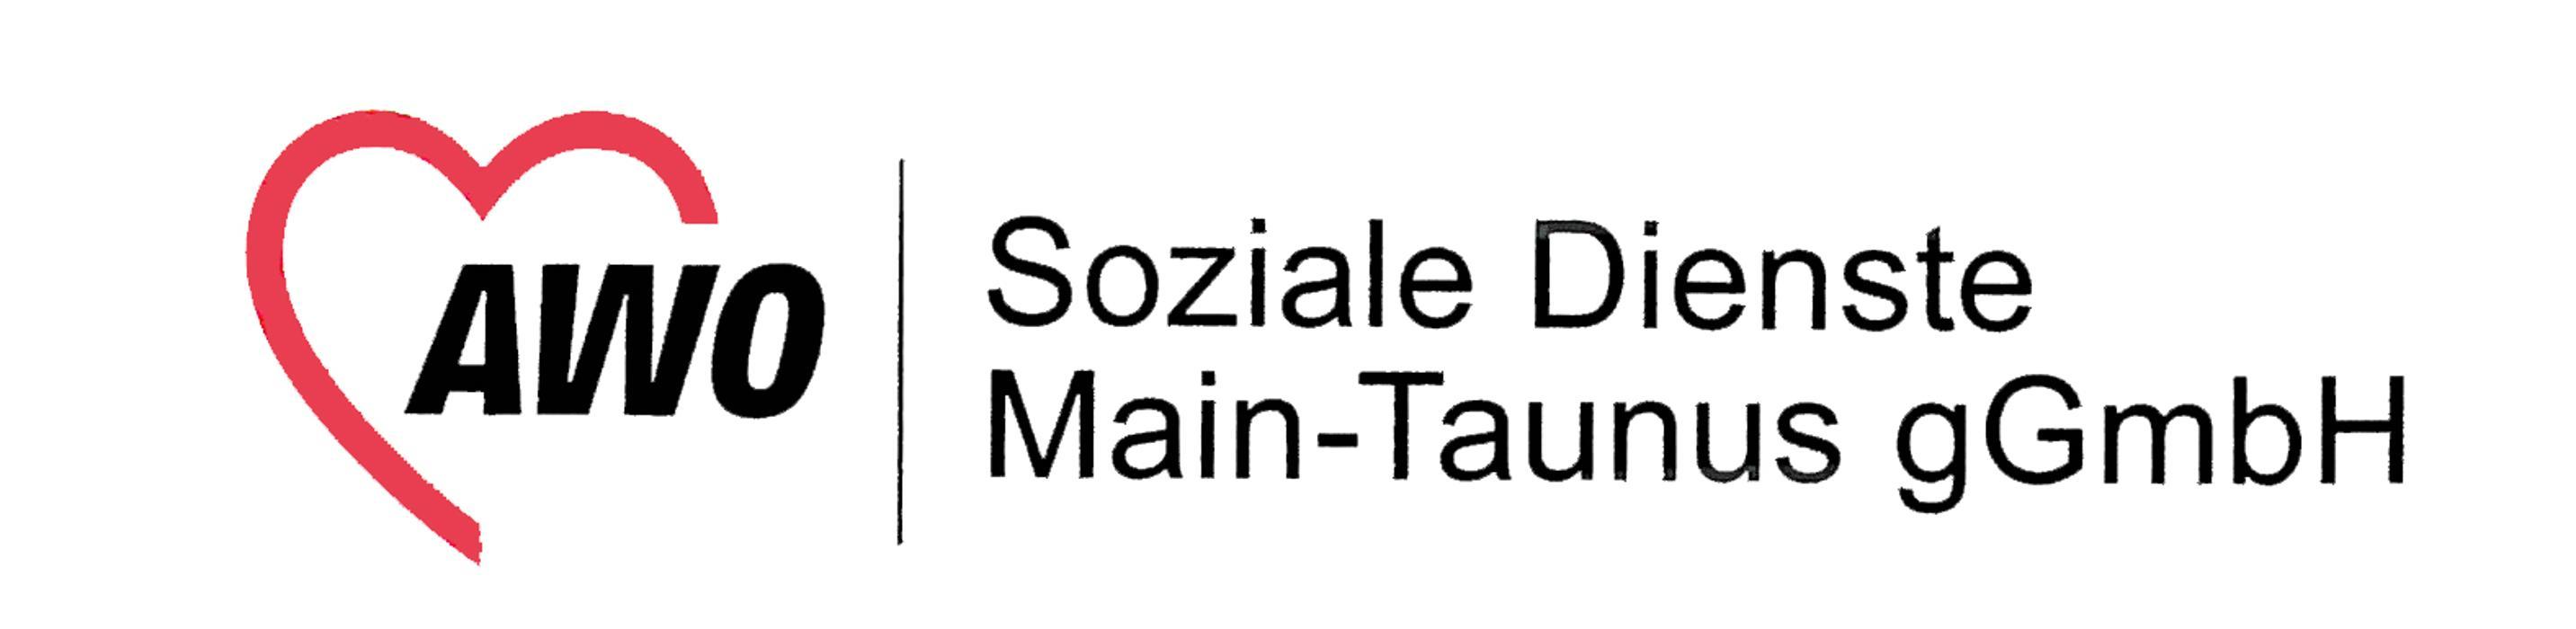 Bild zu AWO Kreisverband Main-Taunus e.V. / Arbeiterwohlfahrt Soziale Dienste Main-Taunus gGmbH in Hattersheim am Main